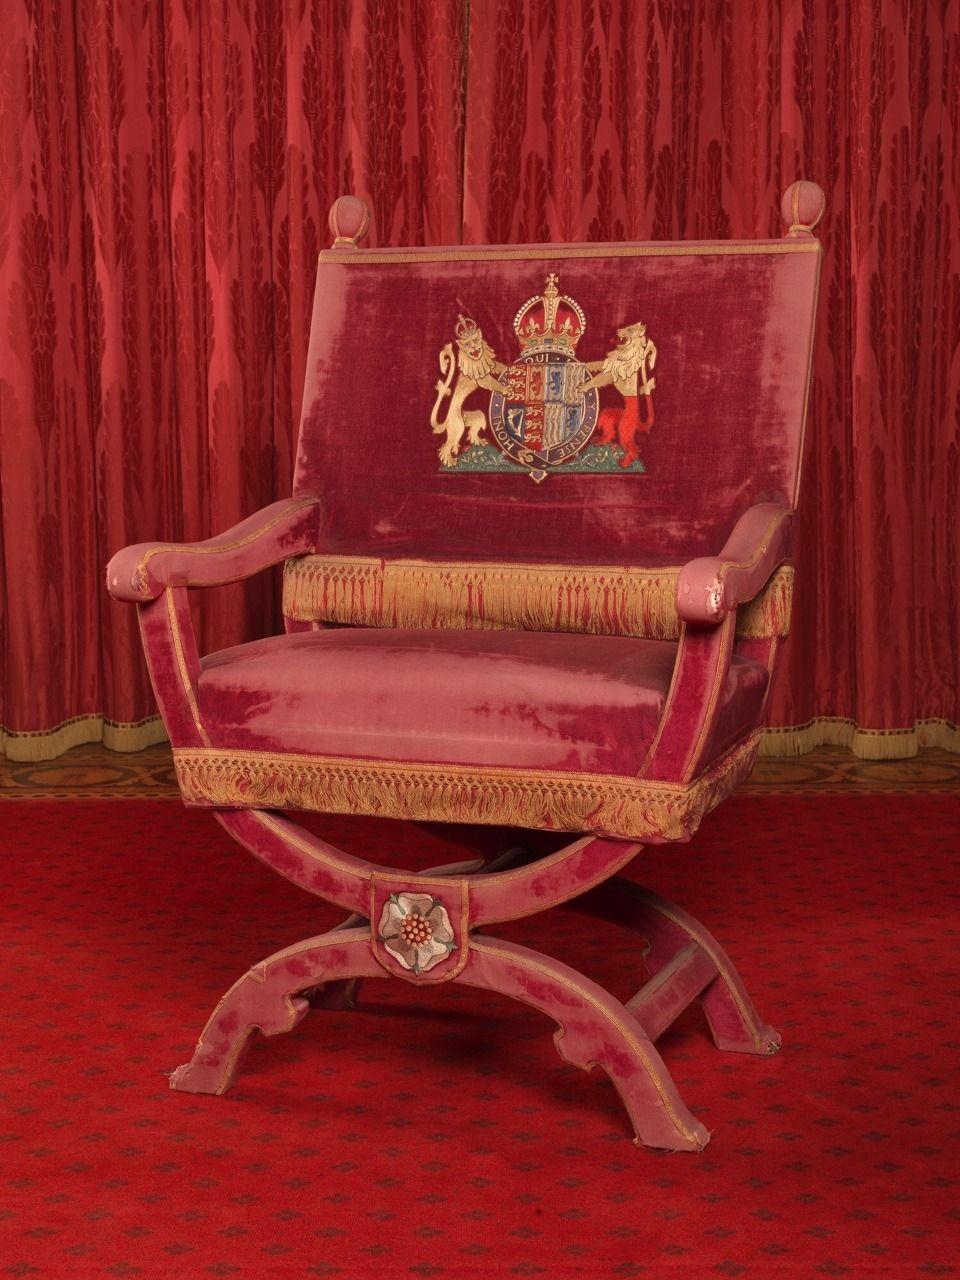 Bon Chair Of Queen Elizabeth, Consort Of King George VI